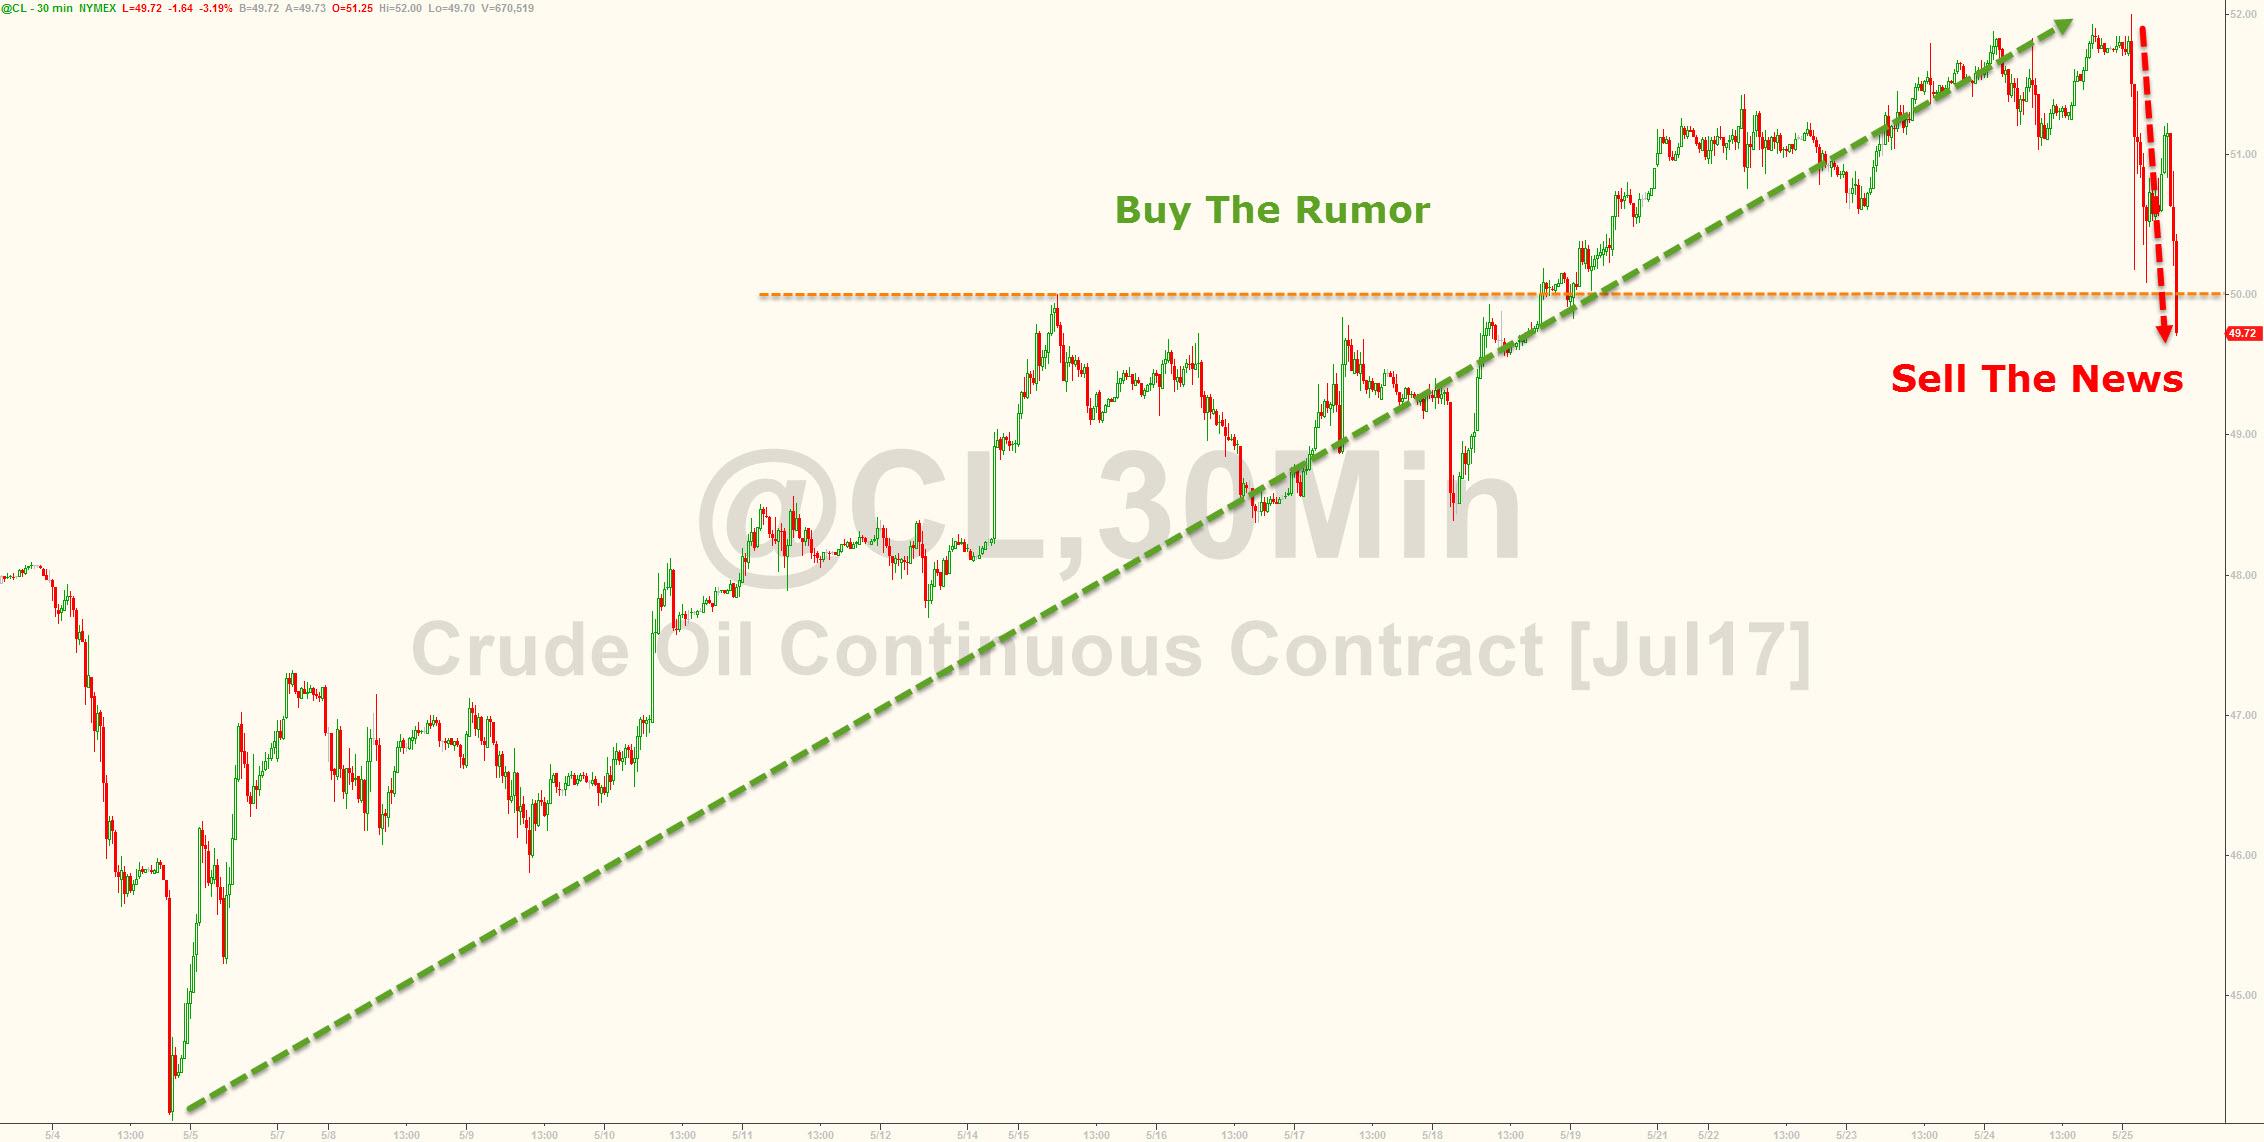 OPEC再减产九个月为何油价暴跌?一文解释你的所有疑惑